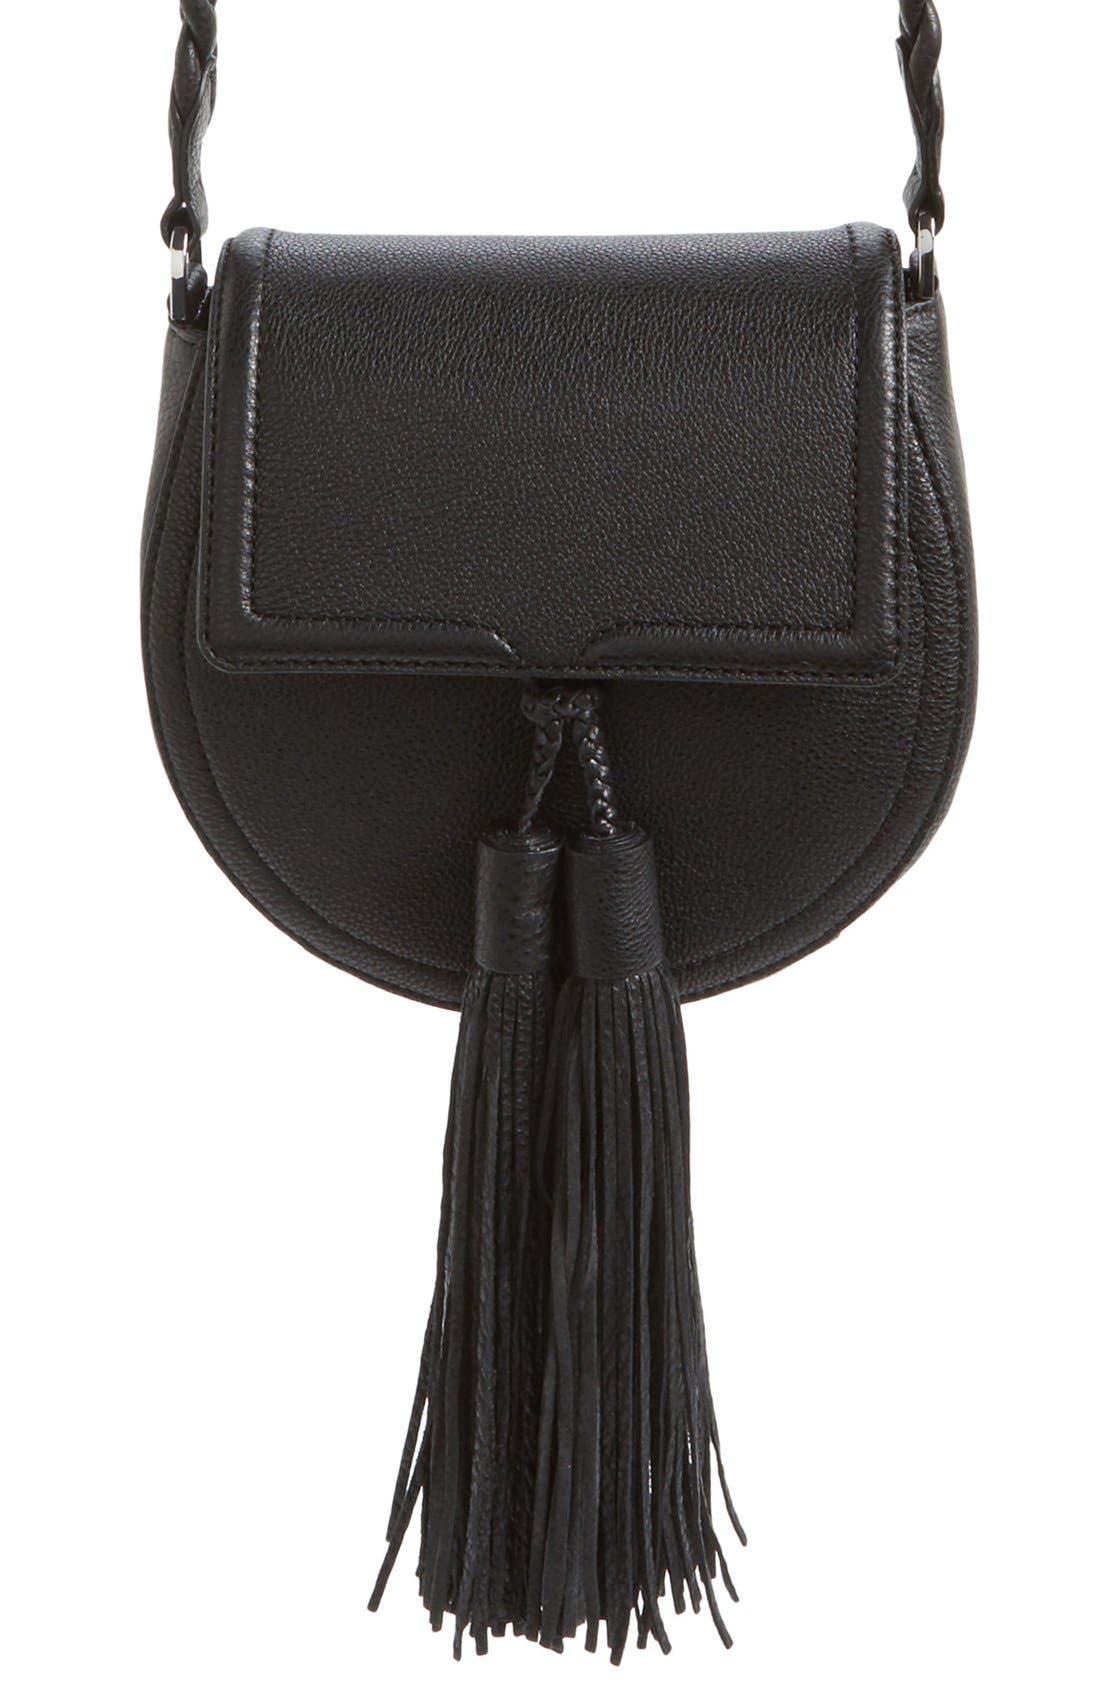 REBECCA MINKOFF, 'Isobel' Saddle Bag, Main thumbnail 1, color, 001